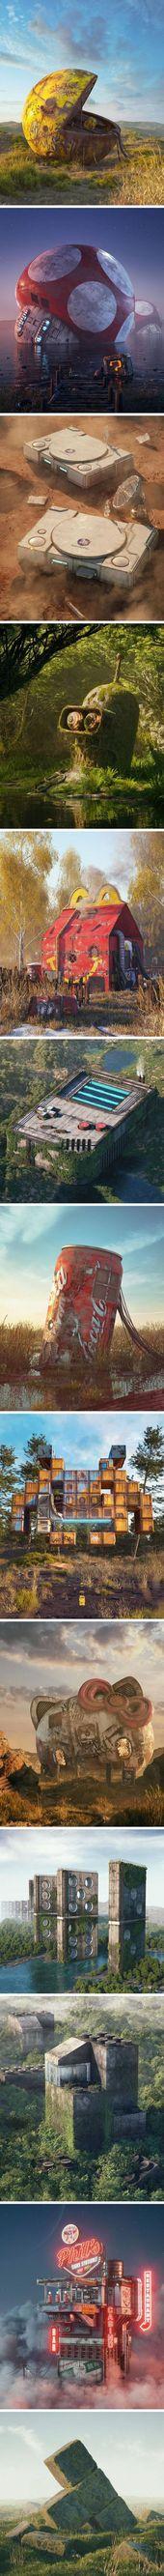 Pop Culture Apocalypse In Amazing Digital Art By Filip Hodas – #Amazing #Apocaly…